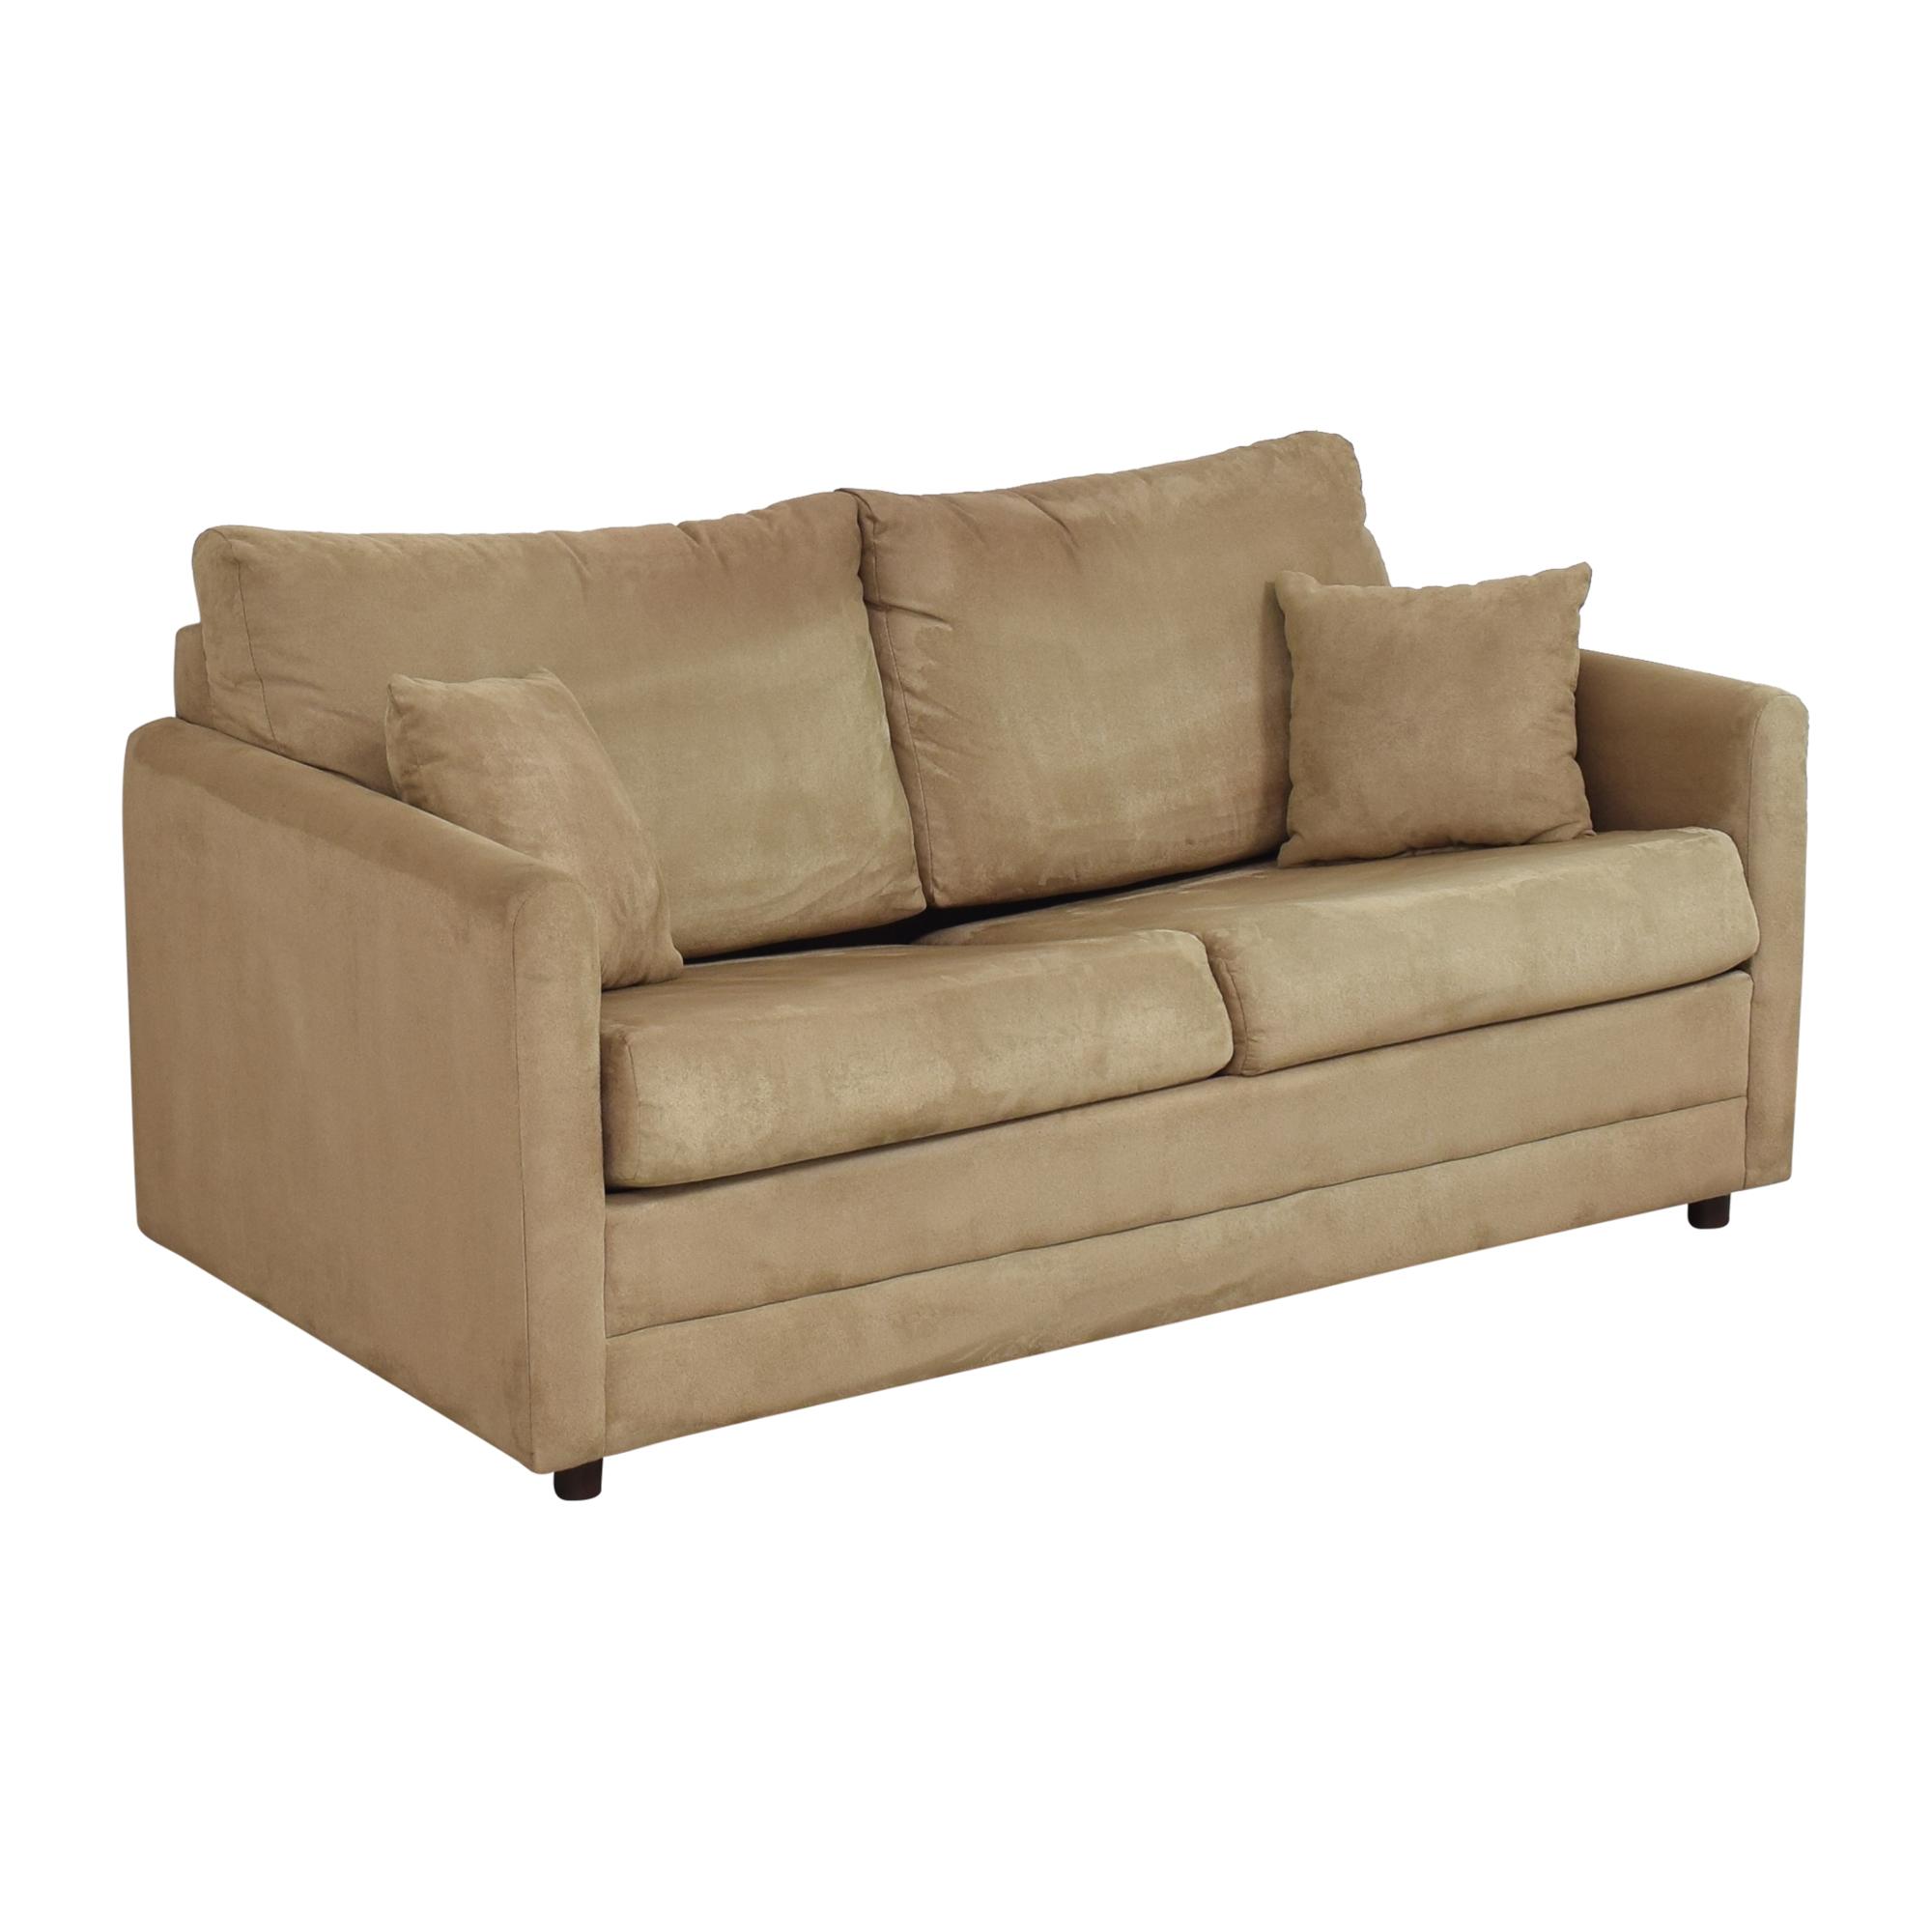 Lacrosse Furniture Two Cushion Sleeper Loveseat LaCrosse Furniture